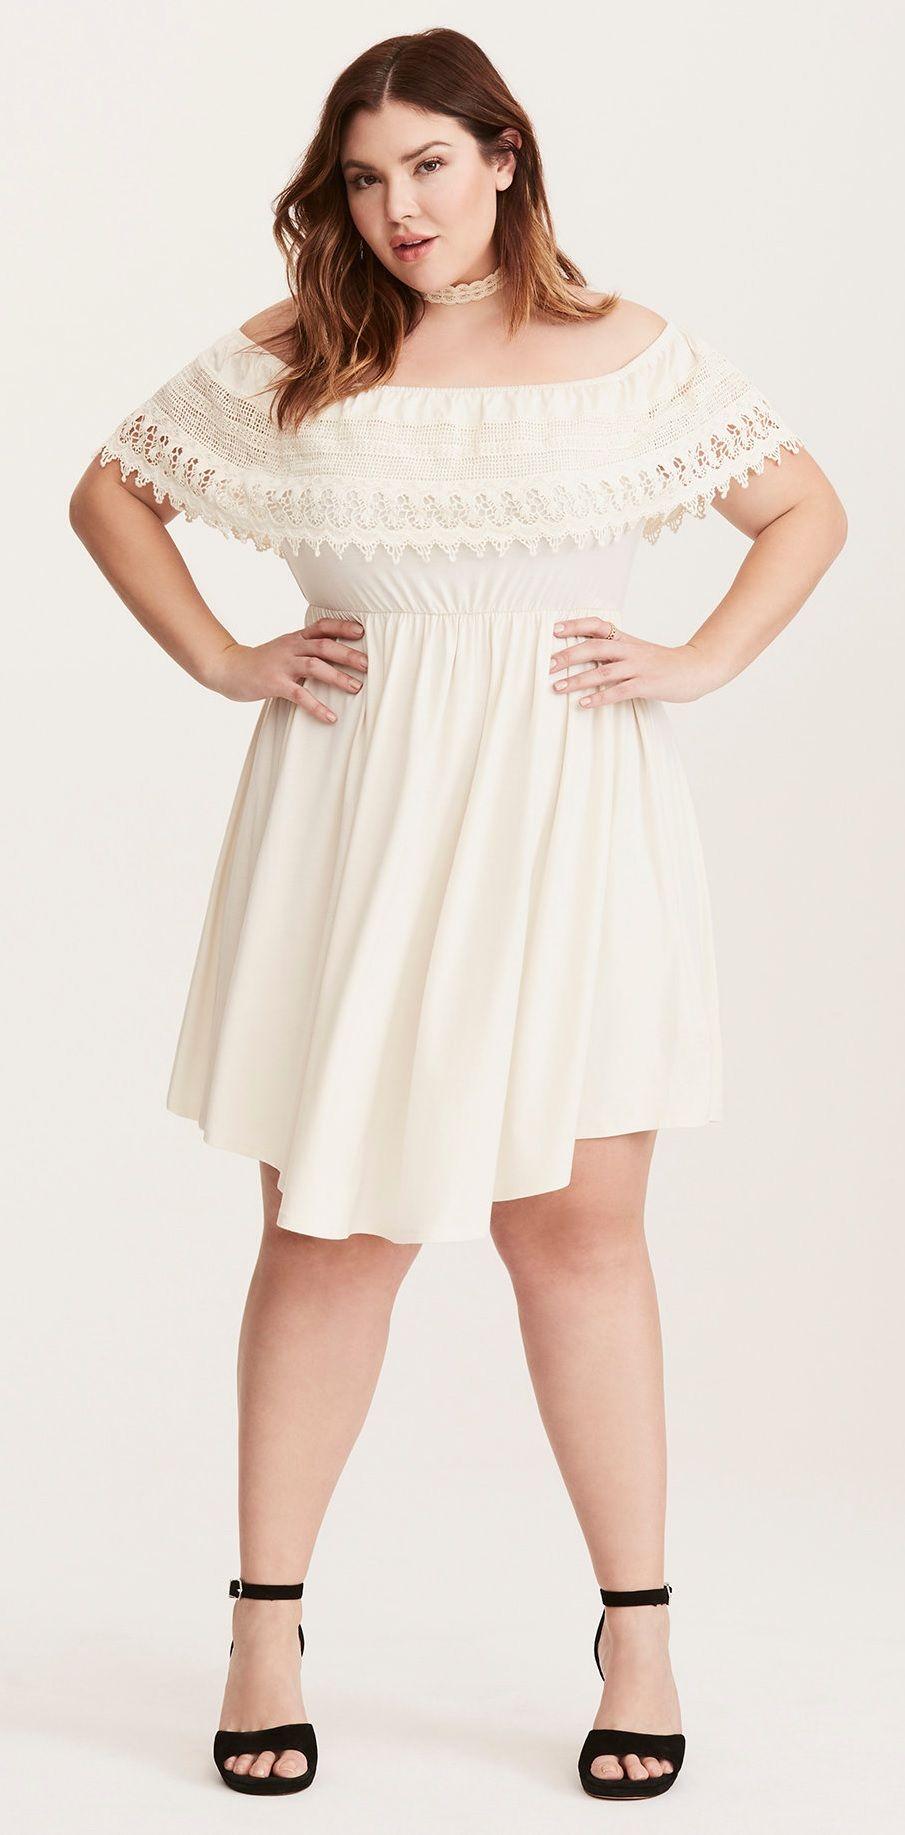 Plus Size Lace Trim Off Shoulder V Hem Dress Torrid Dresses Dresses White Dress